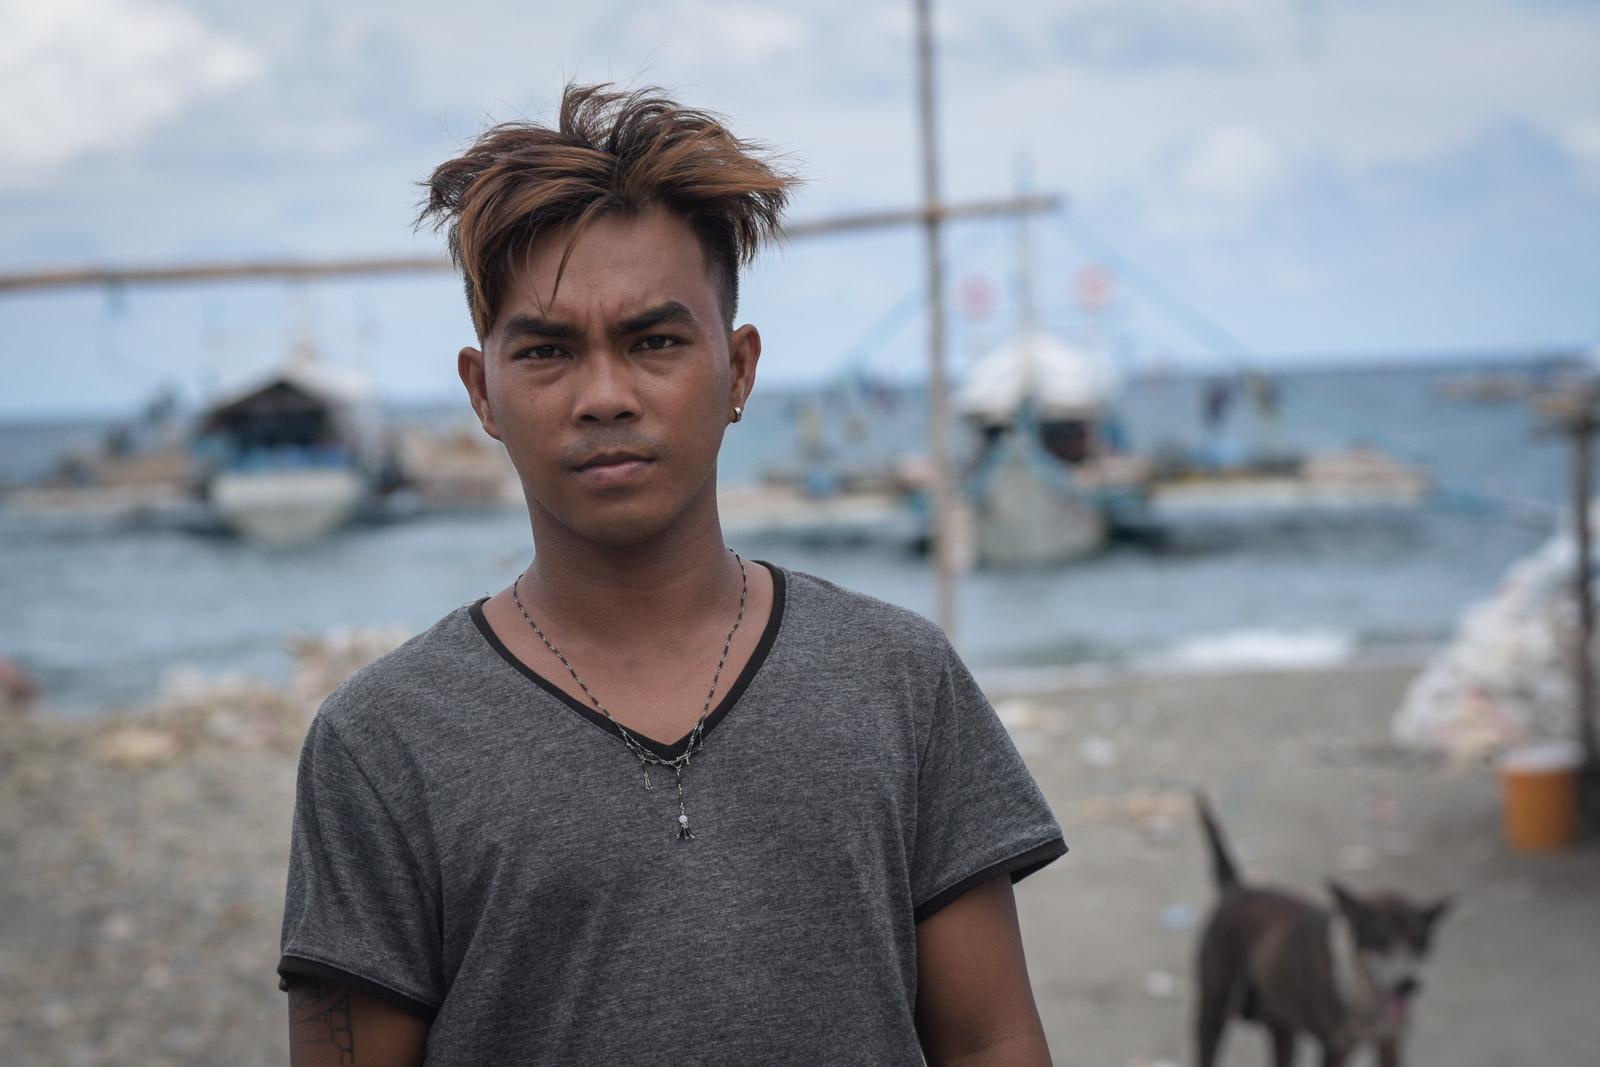 HERO AT SEA. Alvin dela Torre, cousin of Gem-Ver owner Felix dela Torre, volunteered to rescue the 22 fishermen of F/B Gem-Ver.